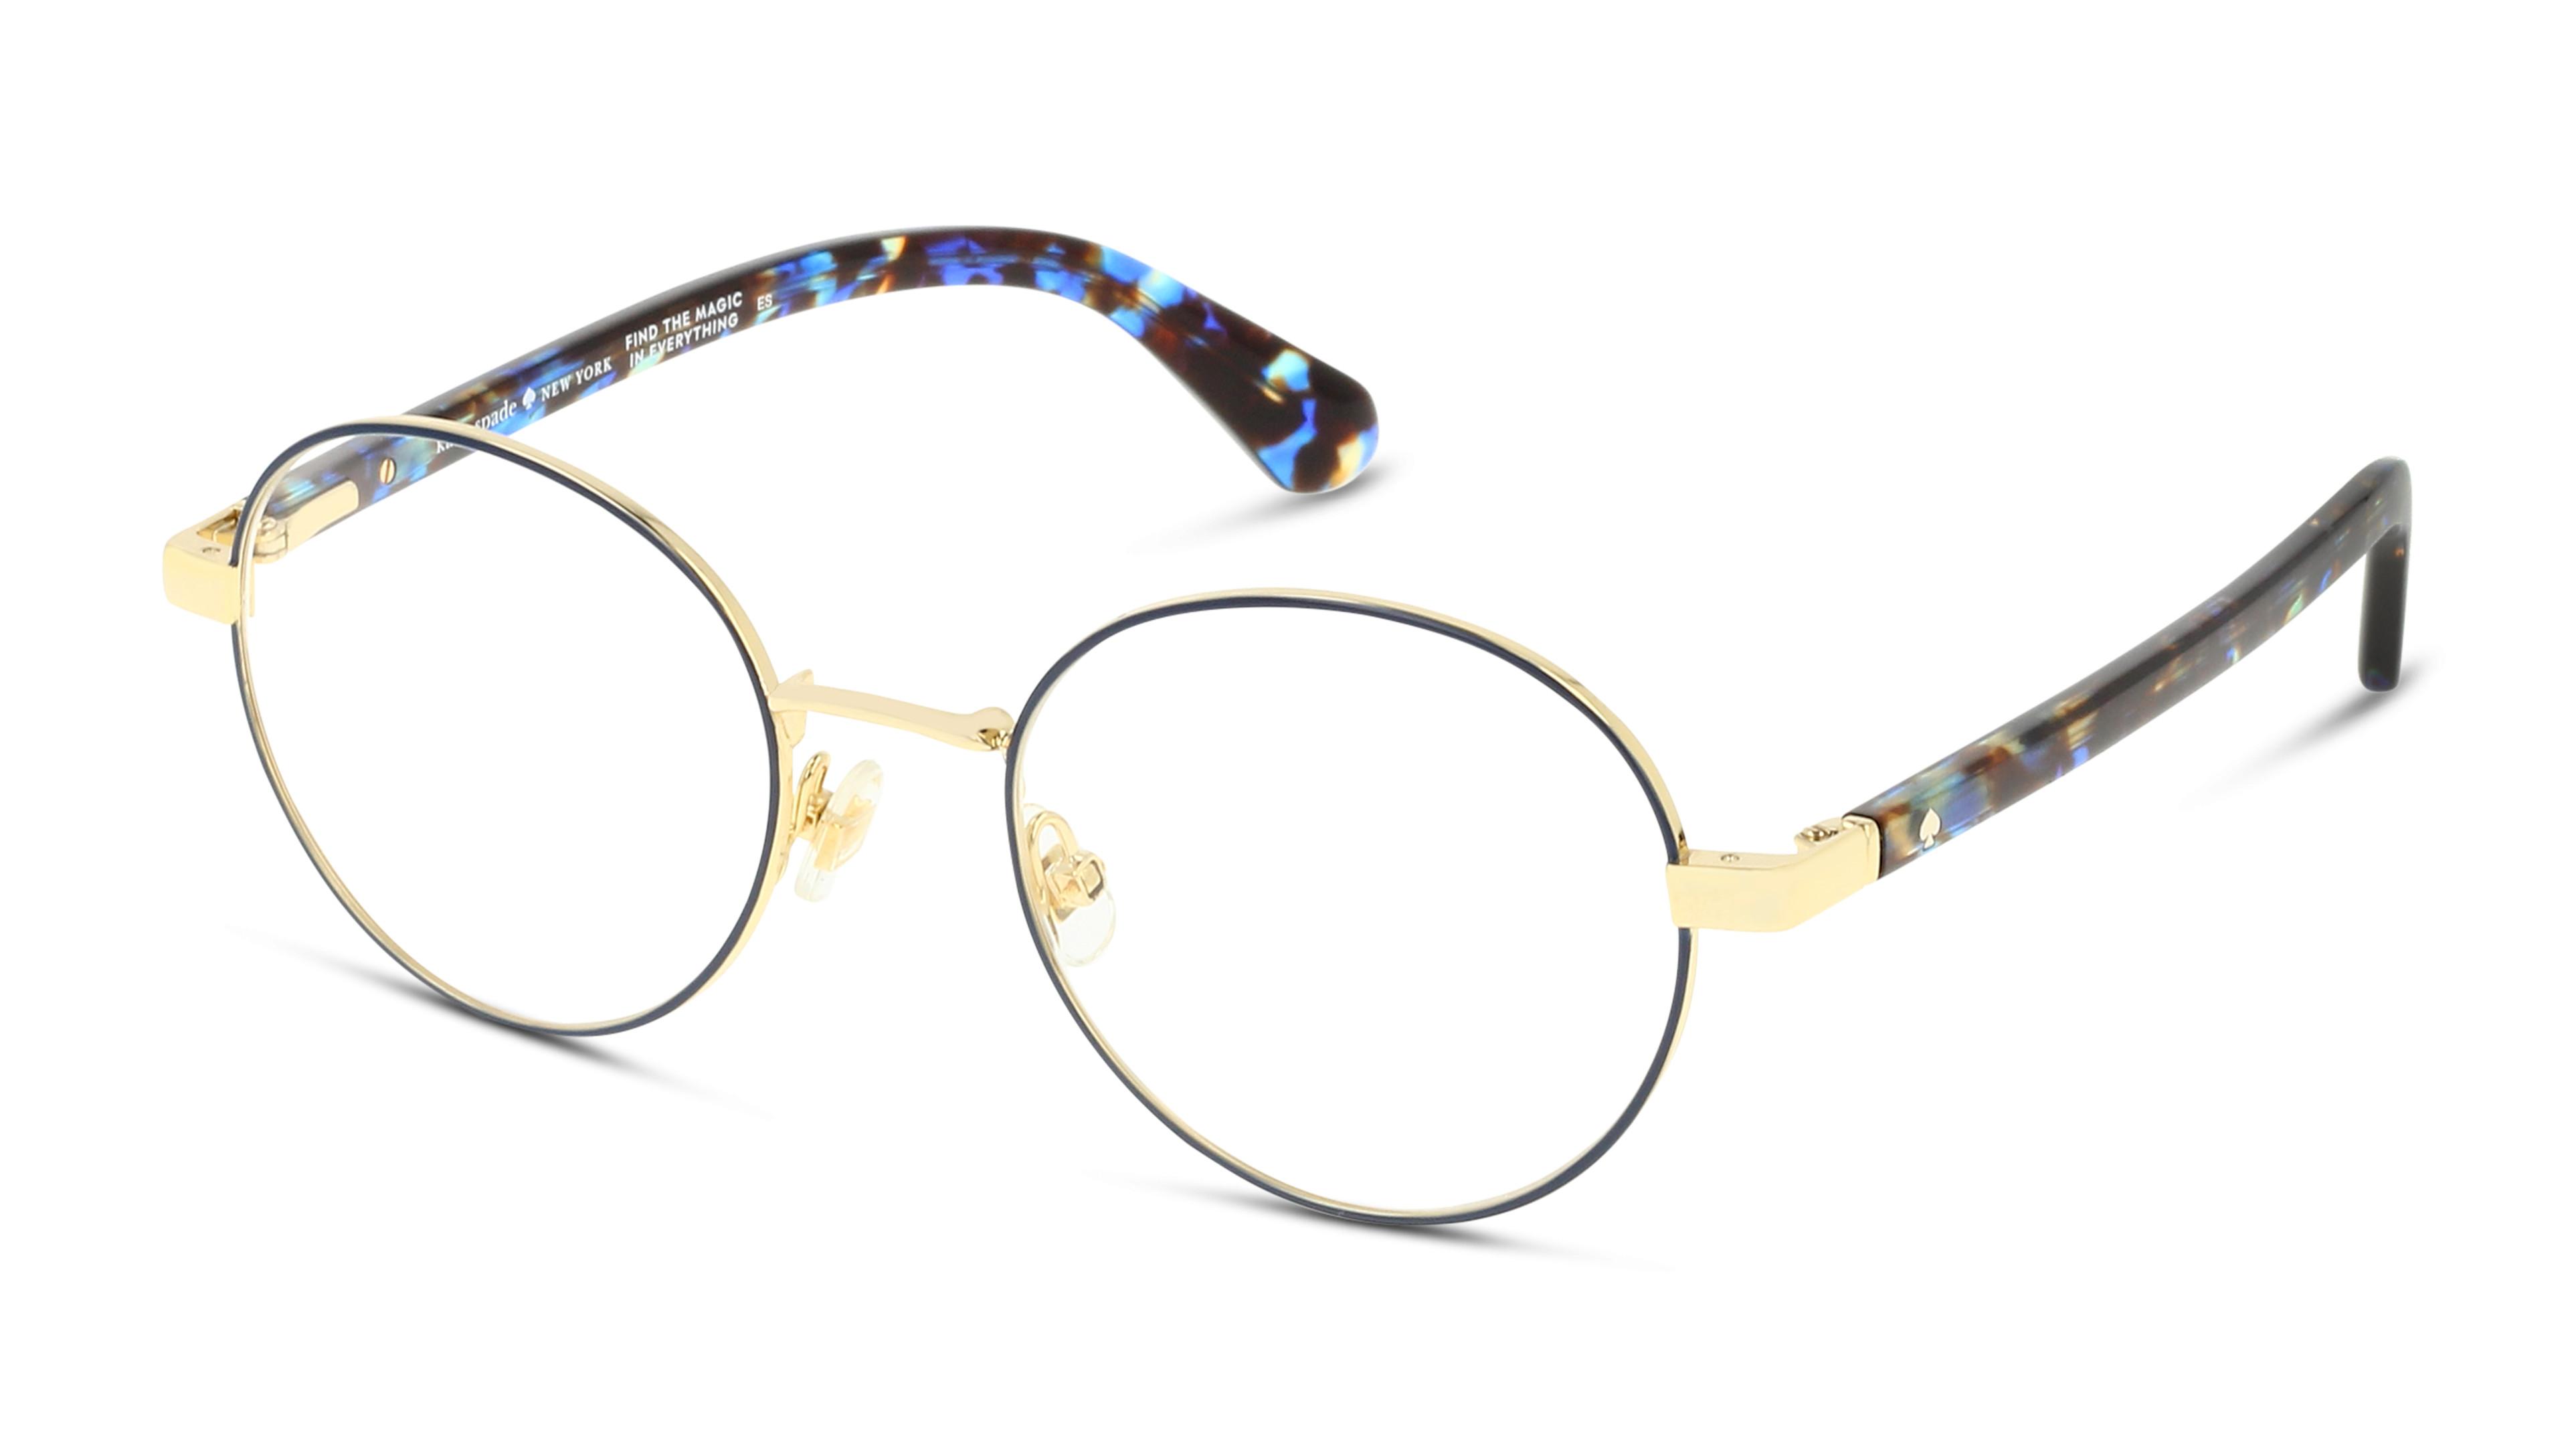 762753994363-angle-03-kate-spade-marciann-Eyewear-pair